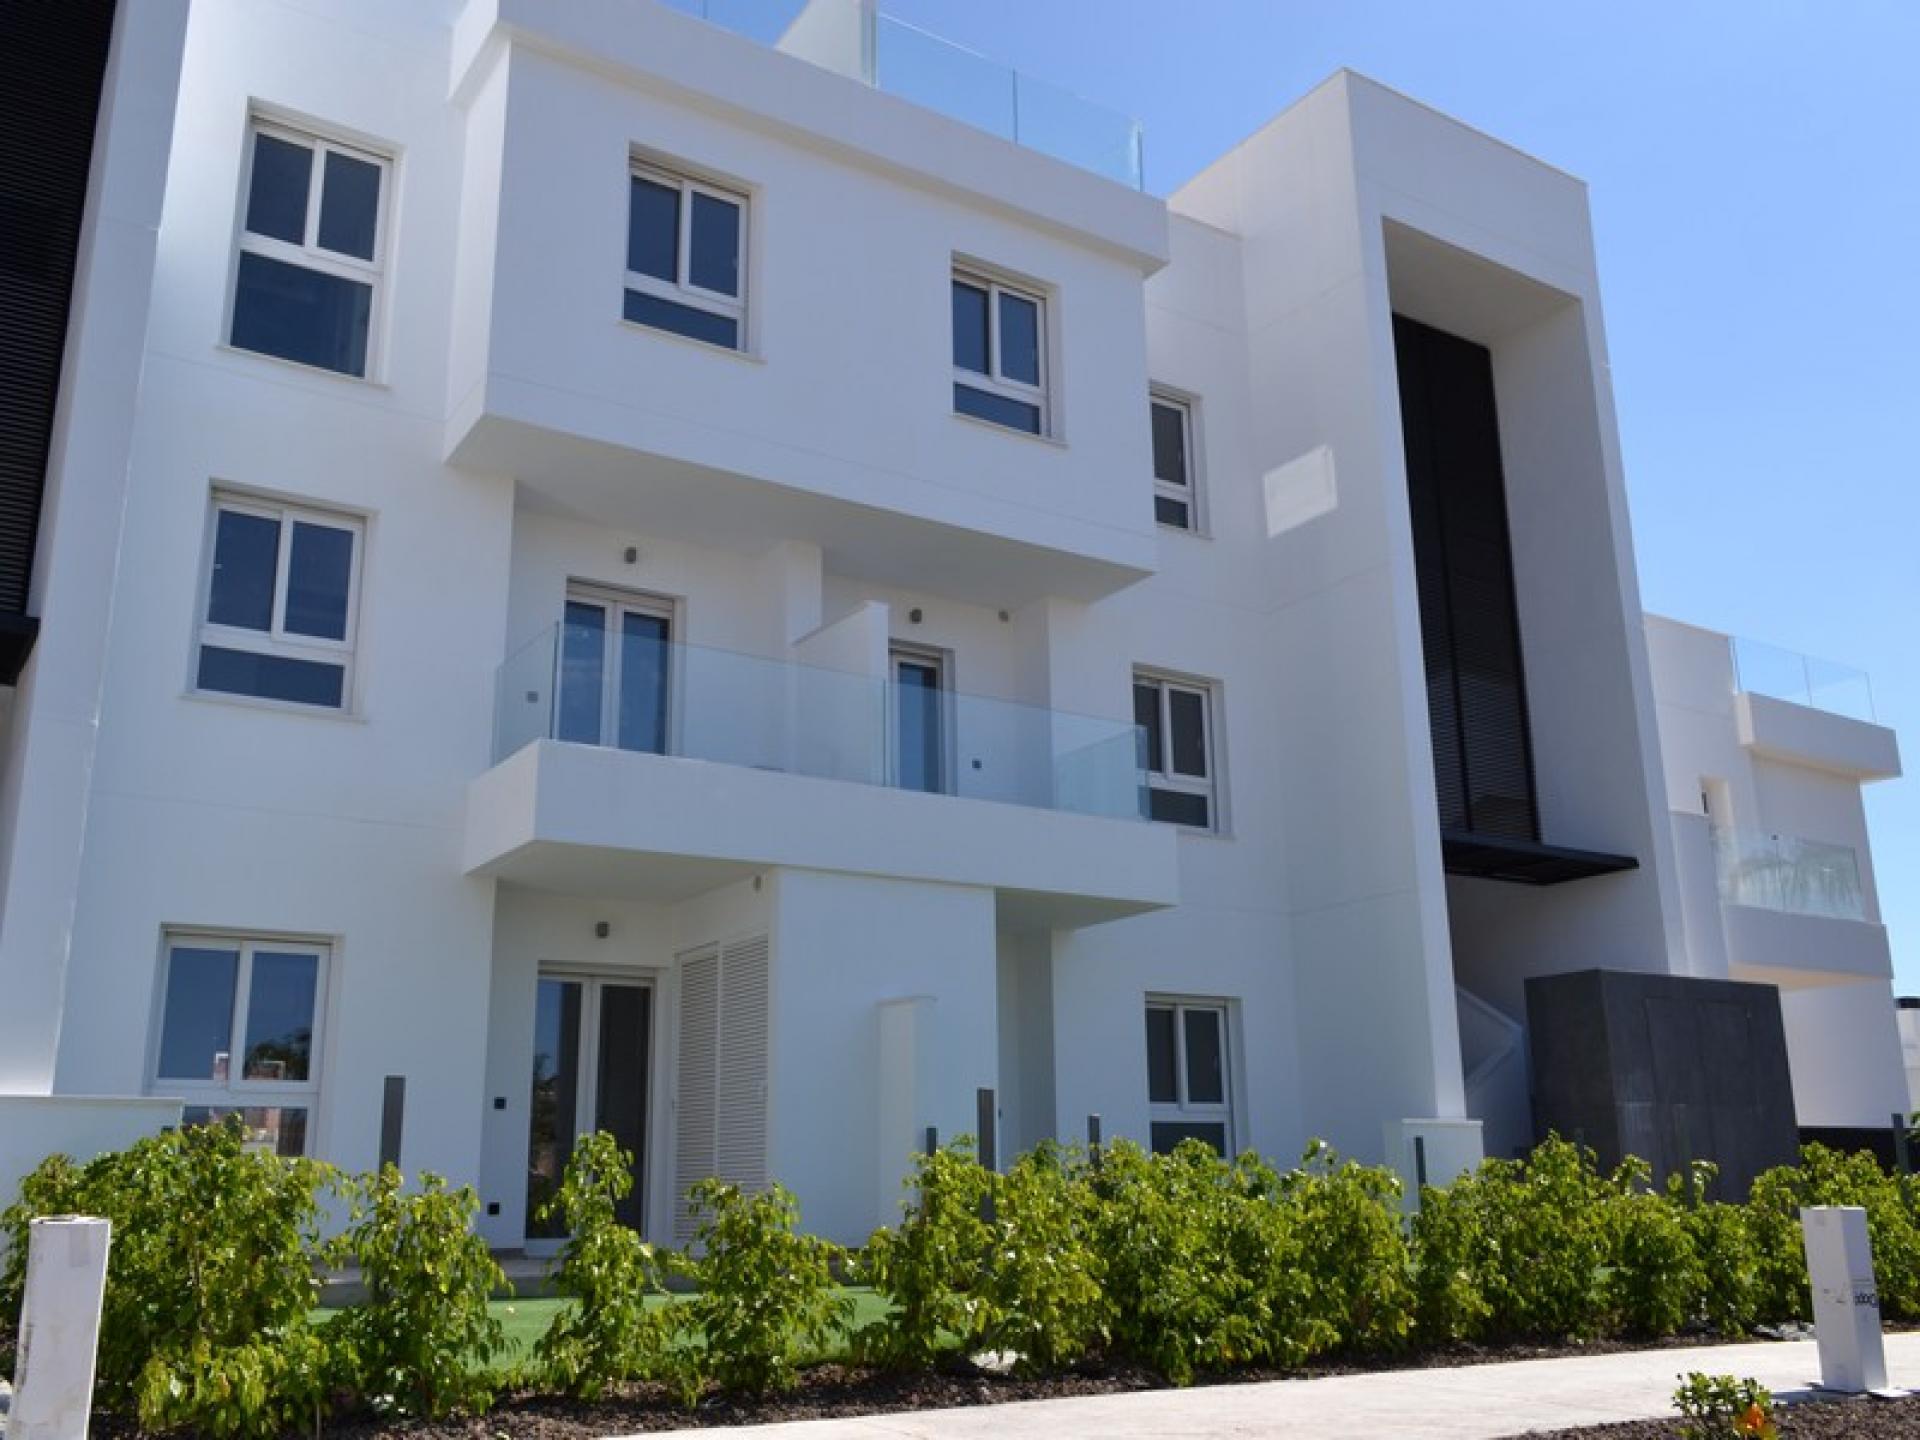 Appartements de luxe au dernier étage à Punta Prima, Orihuela Costa in Medvilla Spanje